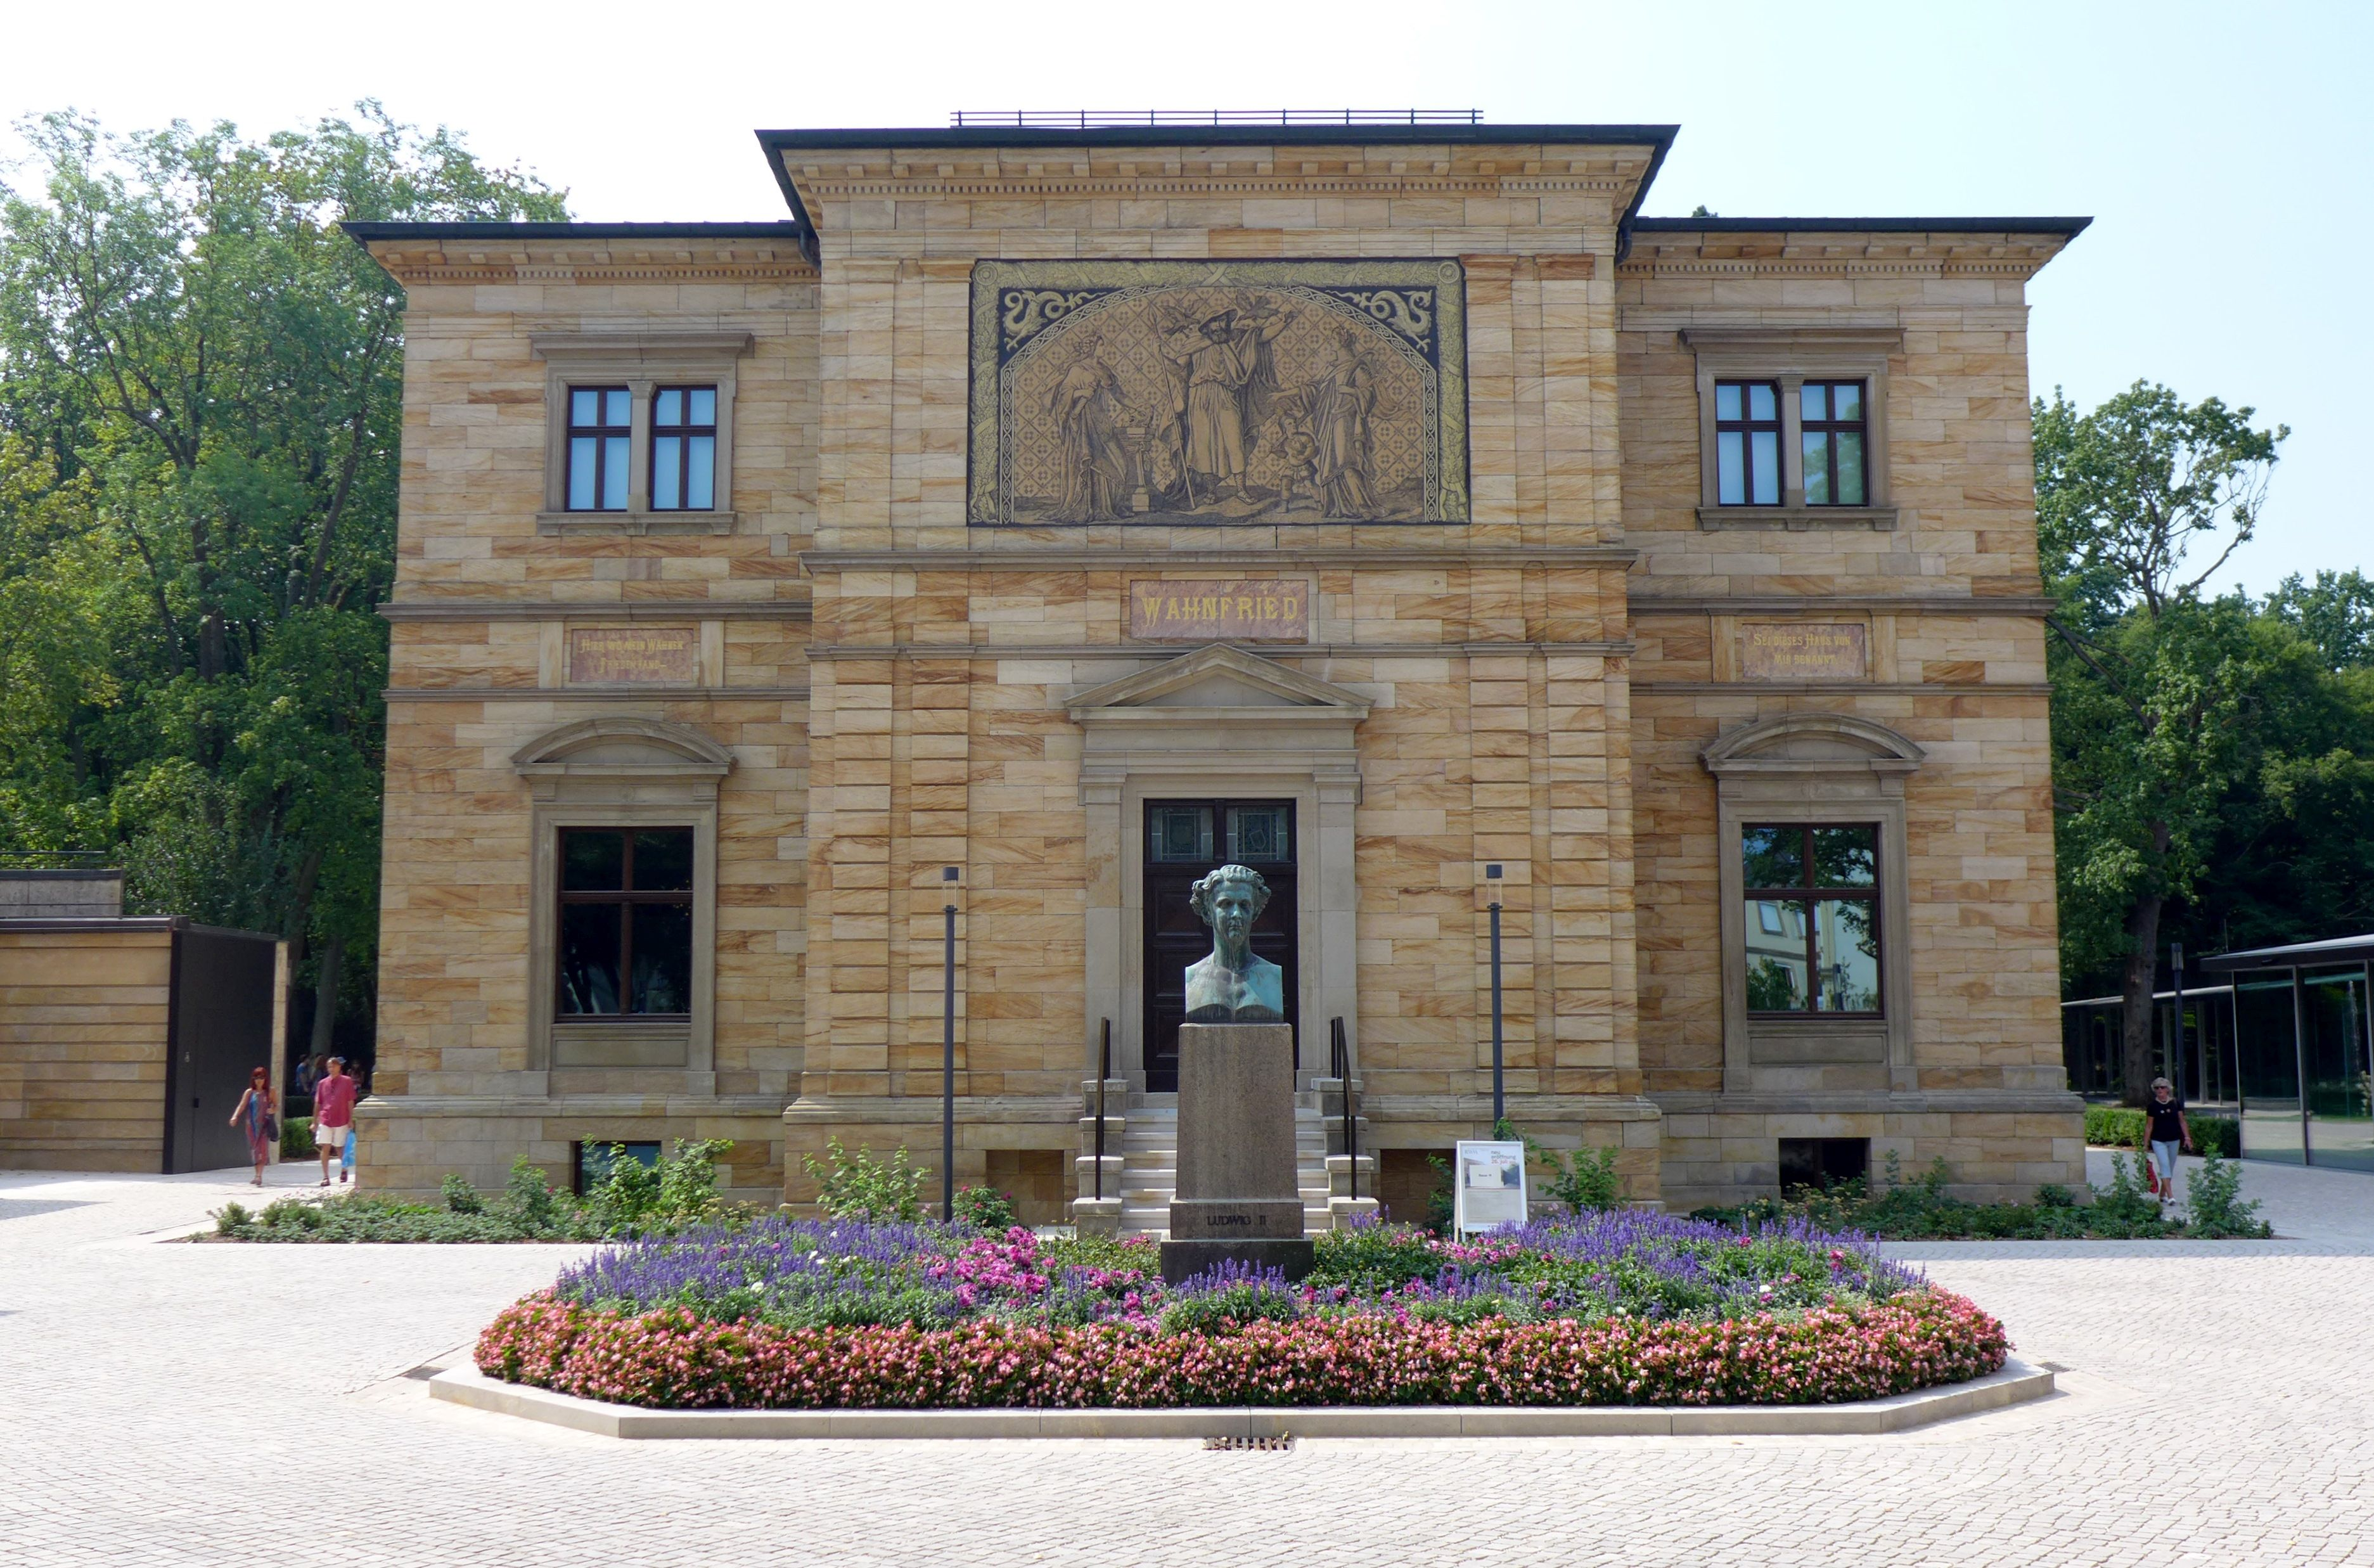 Vila Richarda Wagnera, dnes muzeum. Foto: Petr Feyfar